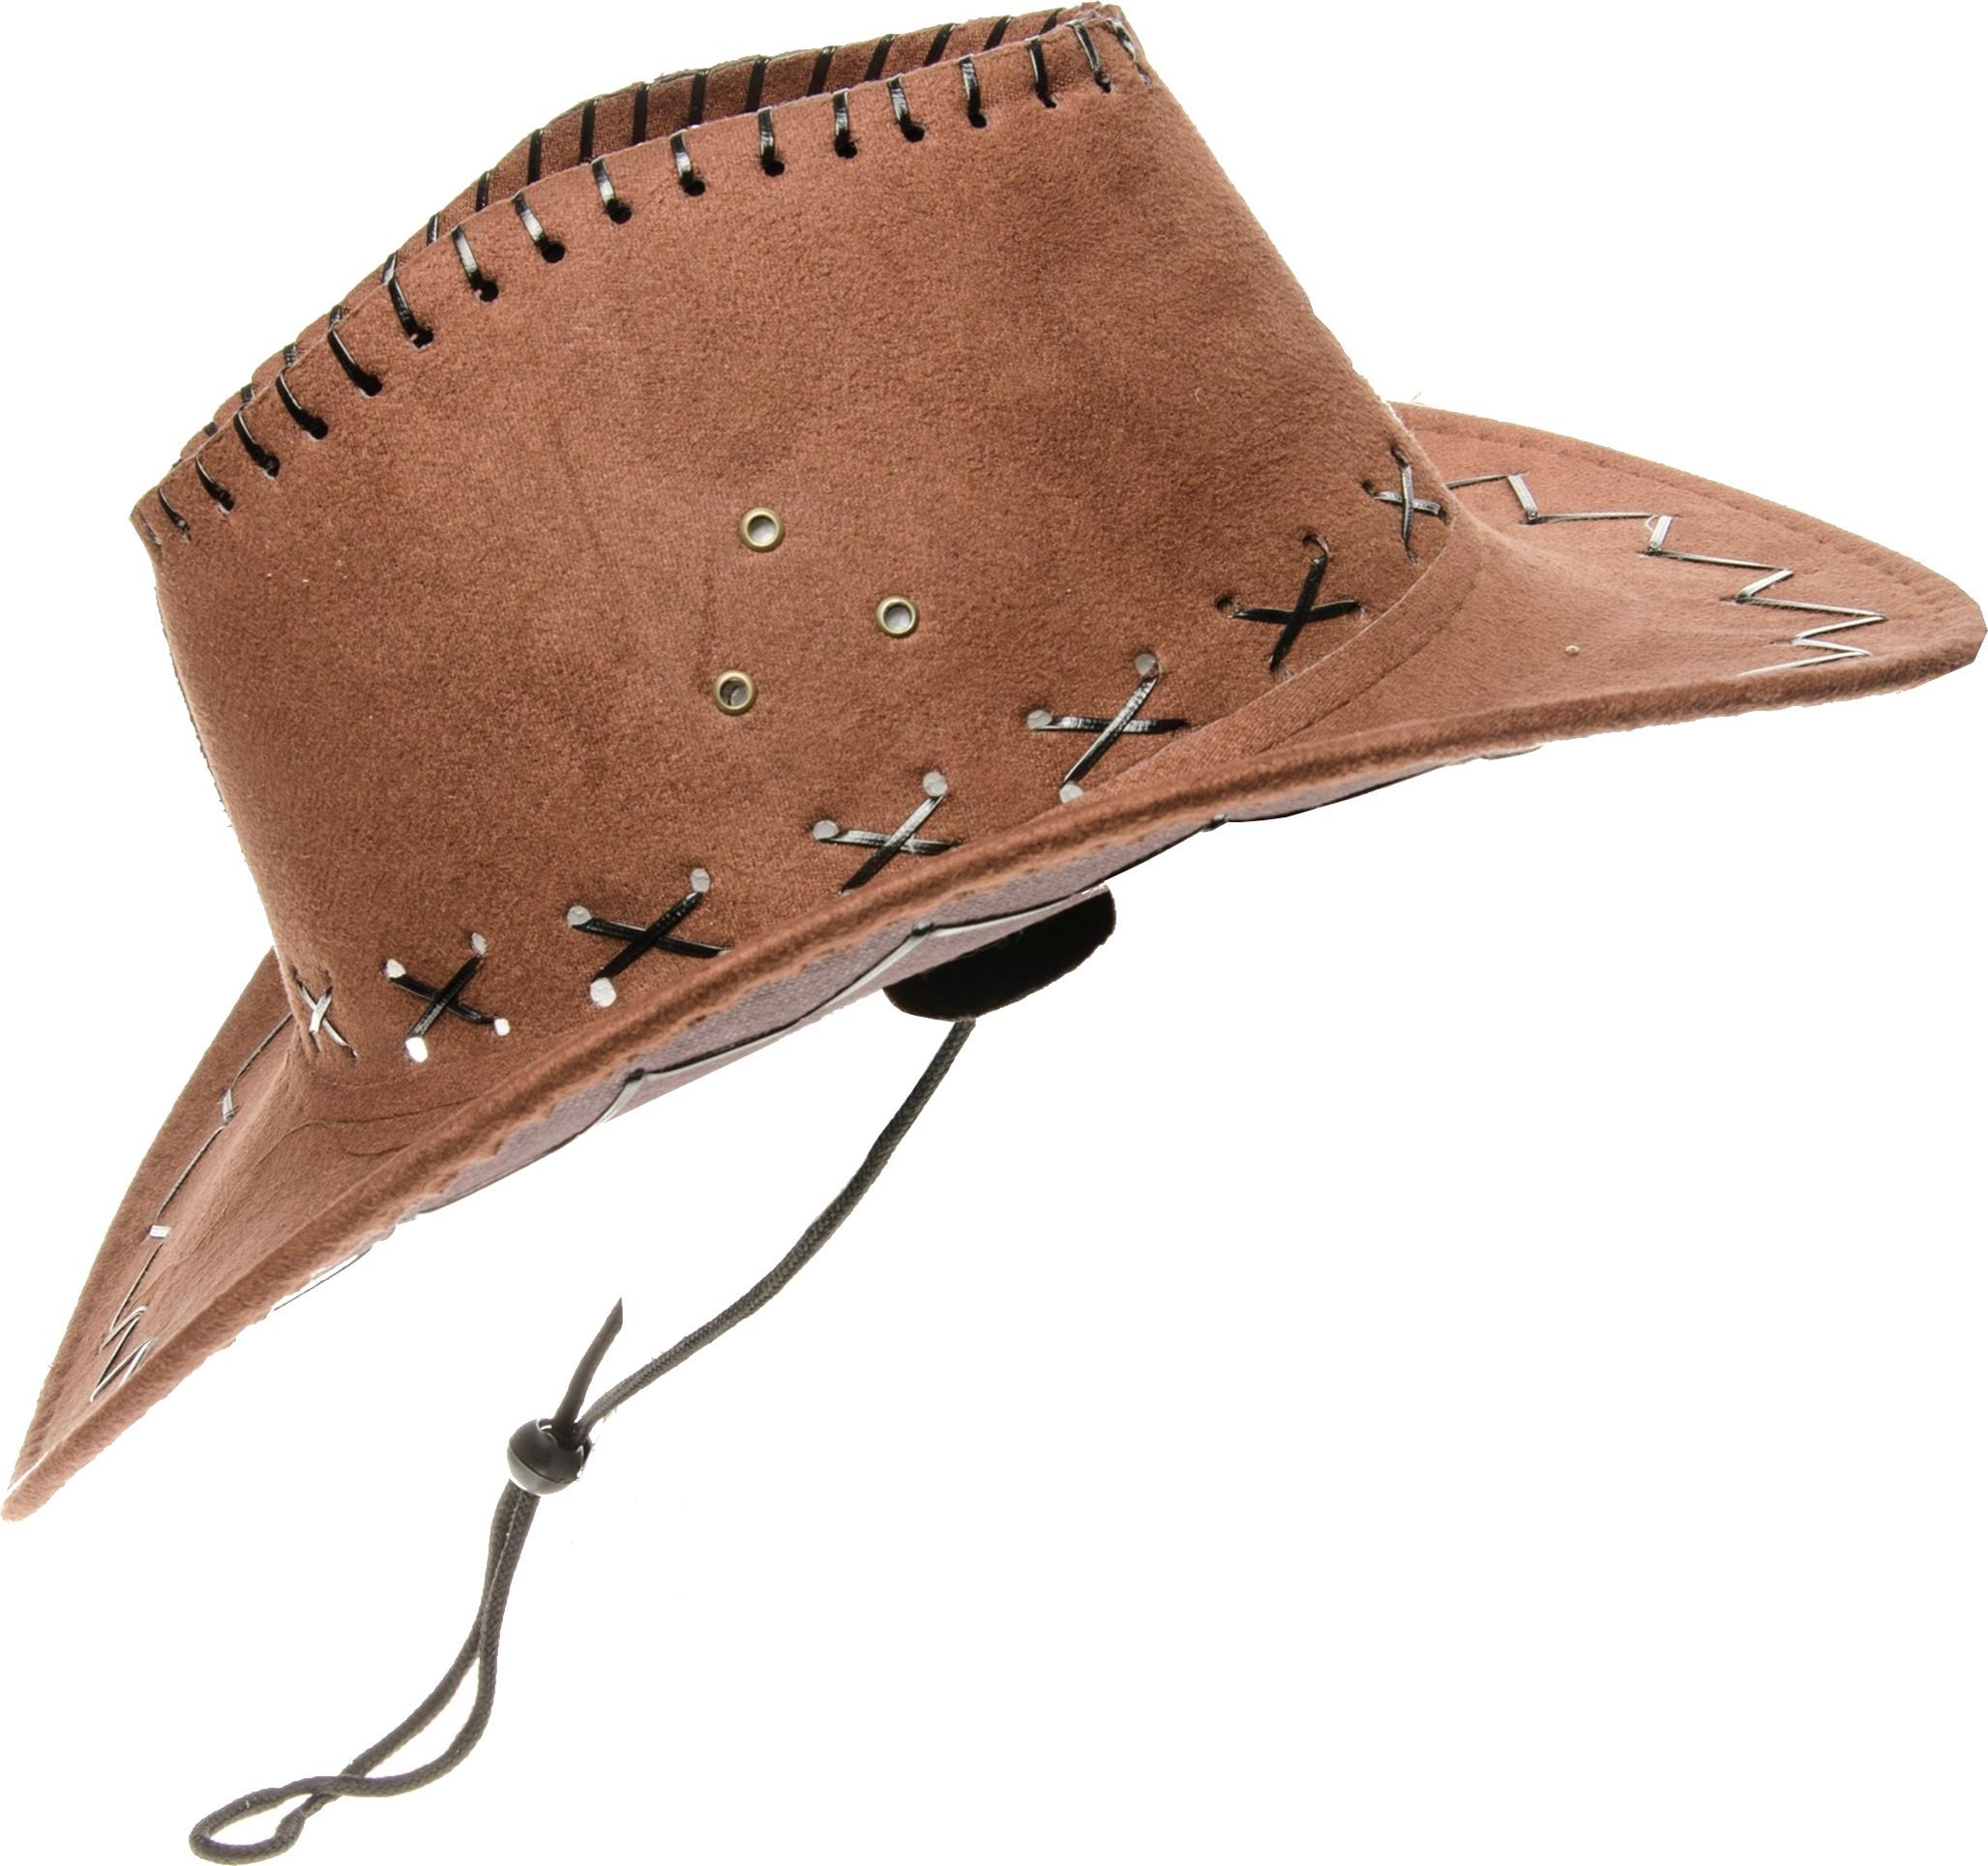 d2758b3d816 LG-Imports Cowboy hat dark brown. Brand  LG-Imports · LG-Imports Cowboy hat  dark brown